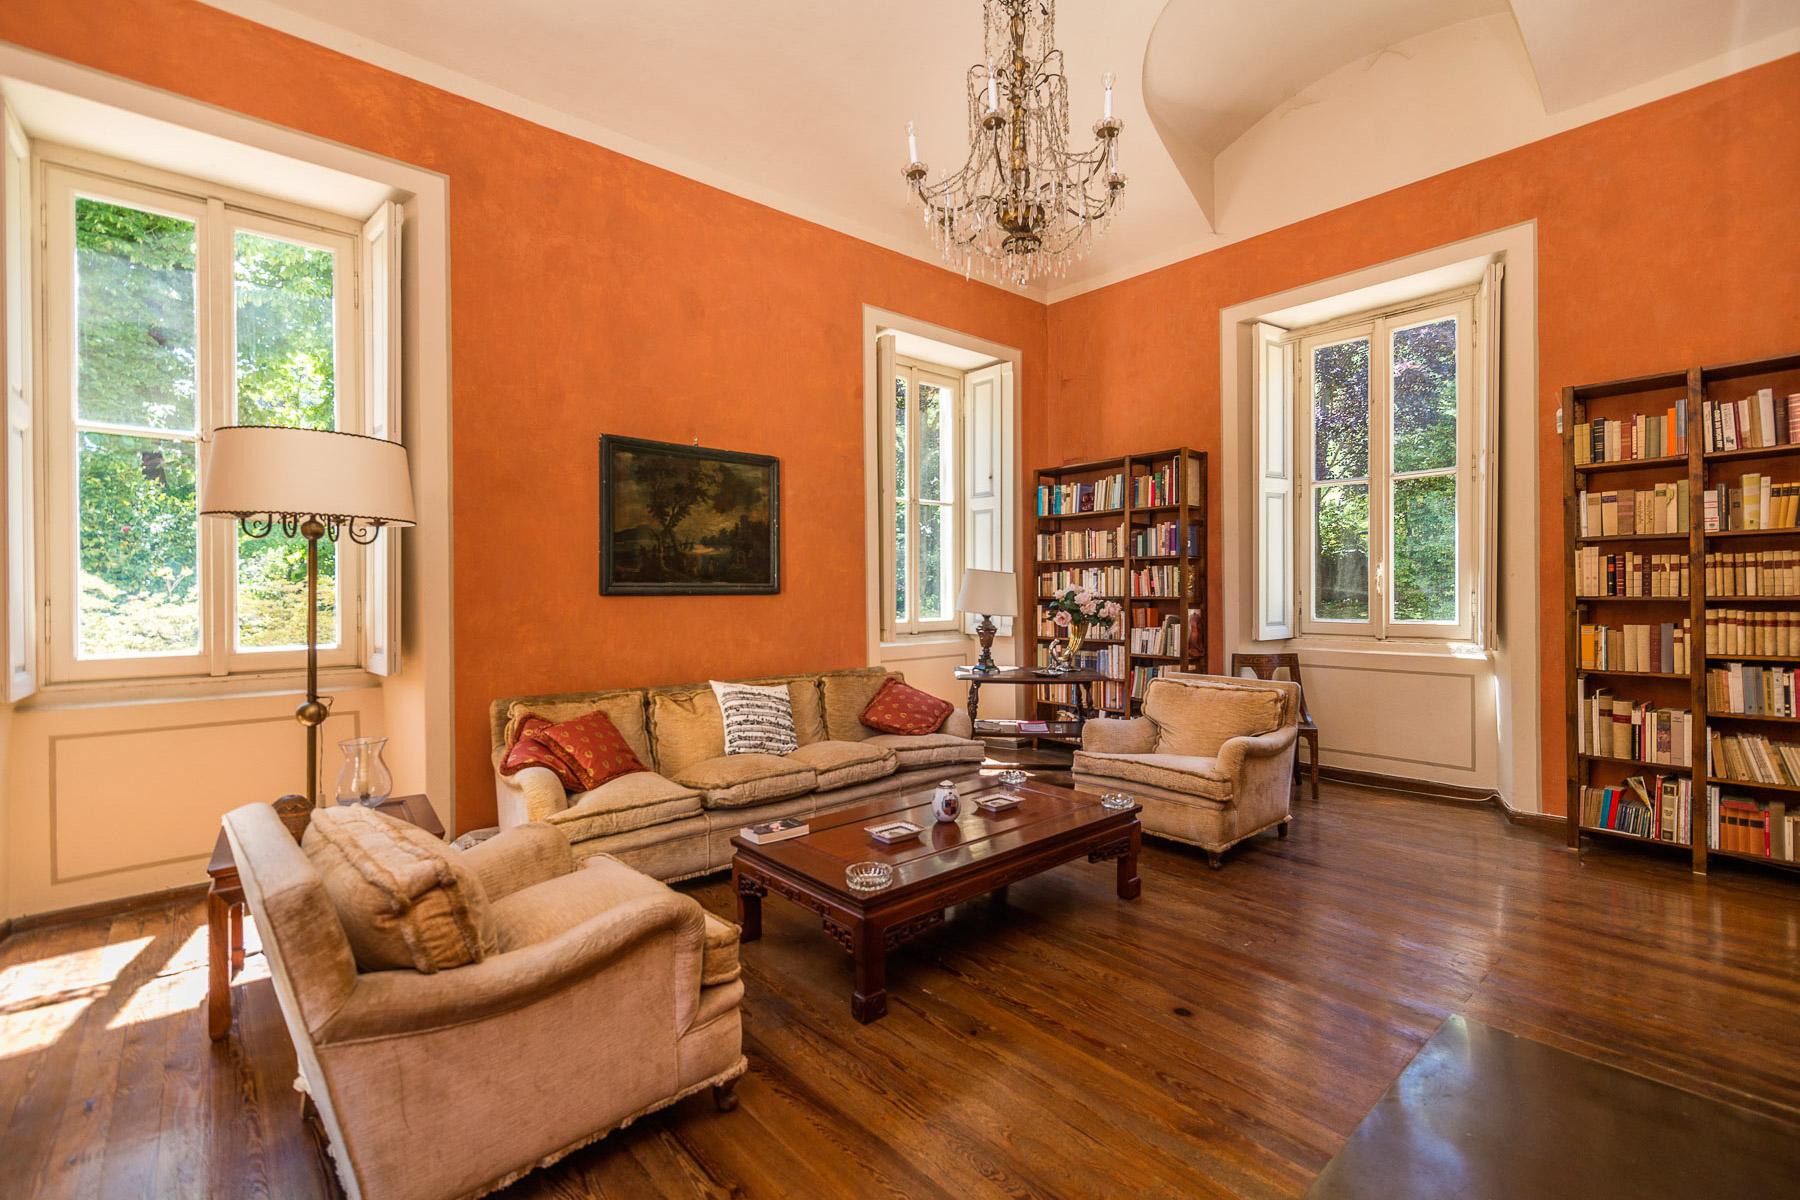 Additional photo for property listing at Enchanting Villa overlooking Orta Lake Via Pietro Durio Autres Novara, Novara 28010 Italie